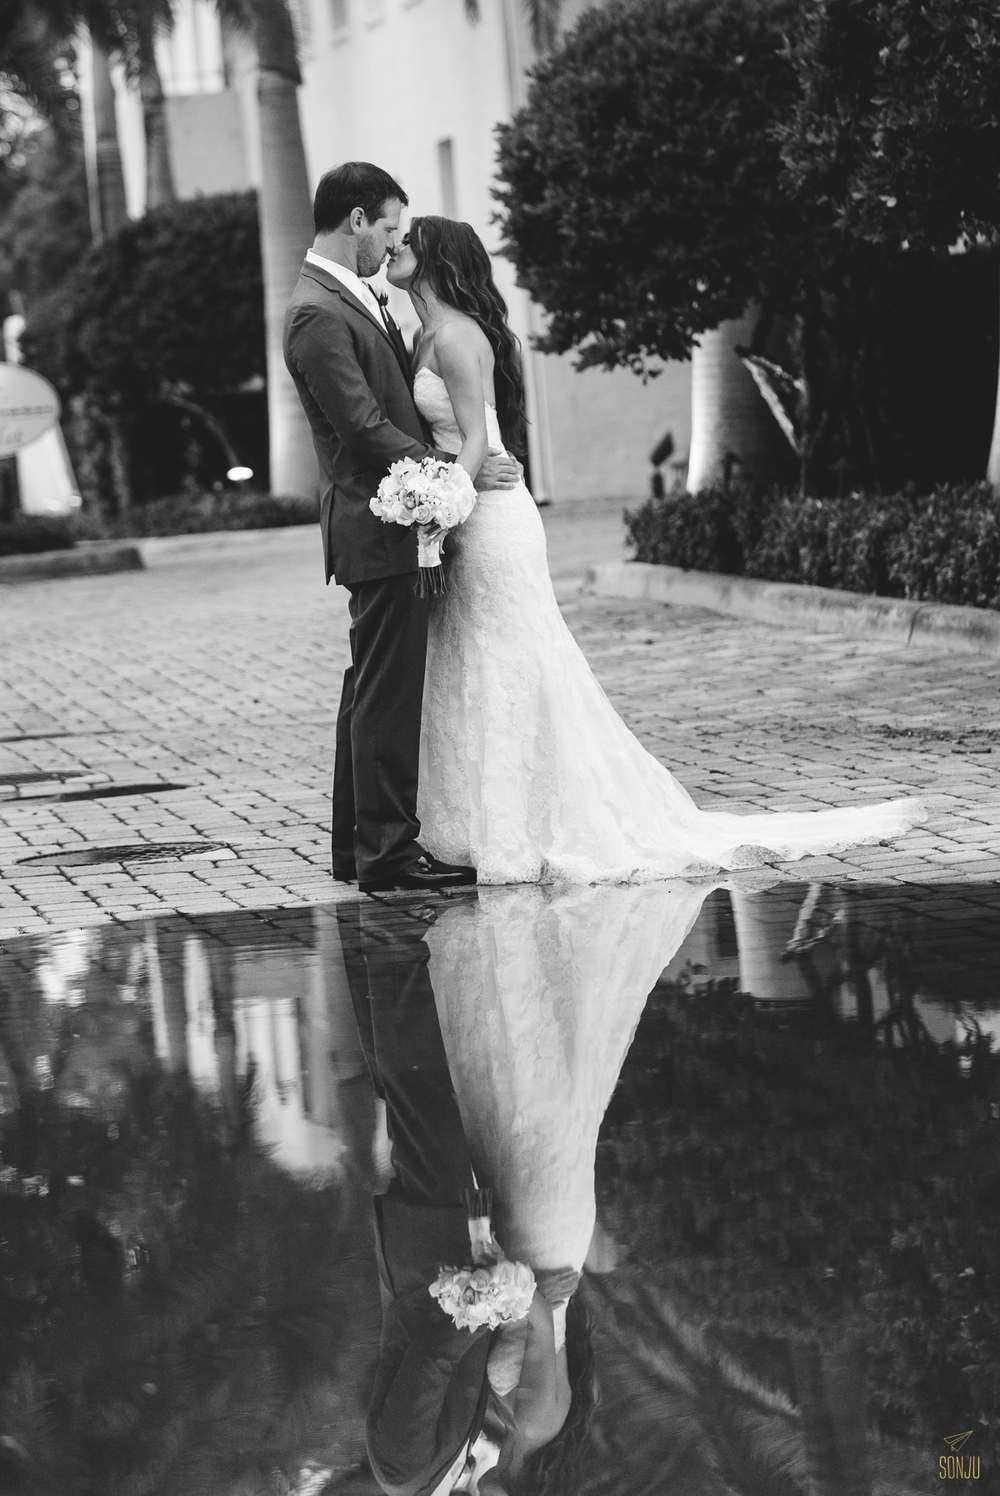 Addison-Wedding-Destination-Photographer-Florida-Beau-Nathalie-Sonju00043.jpg